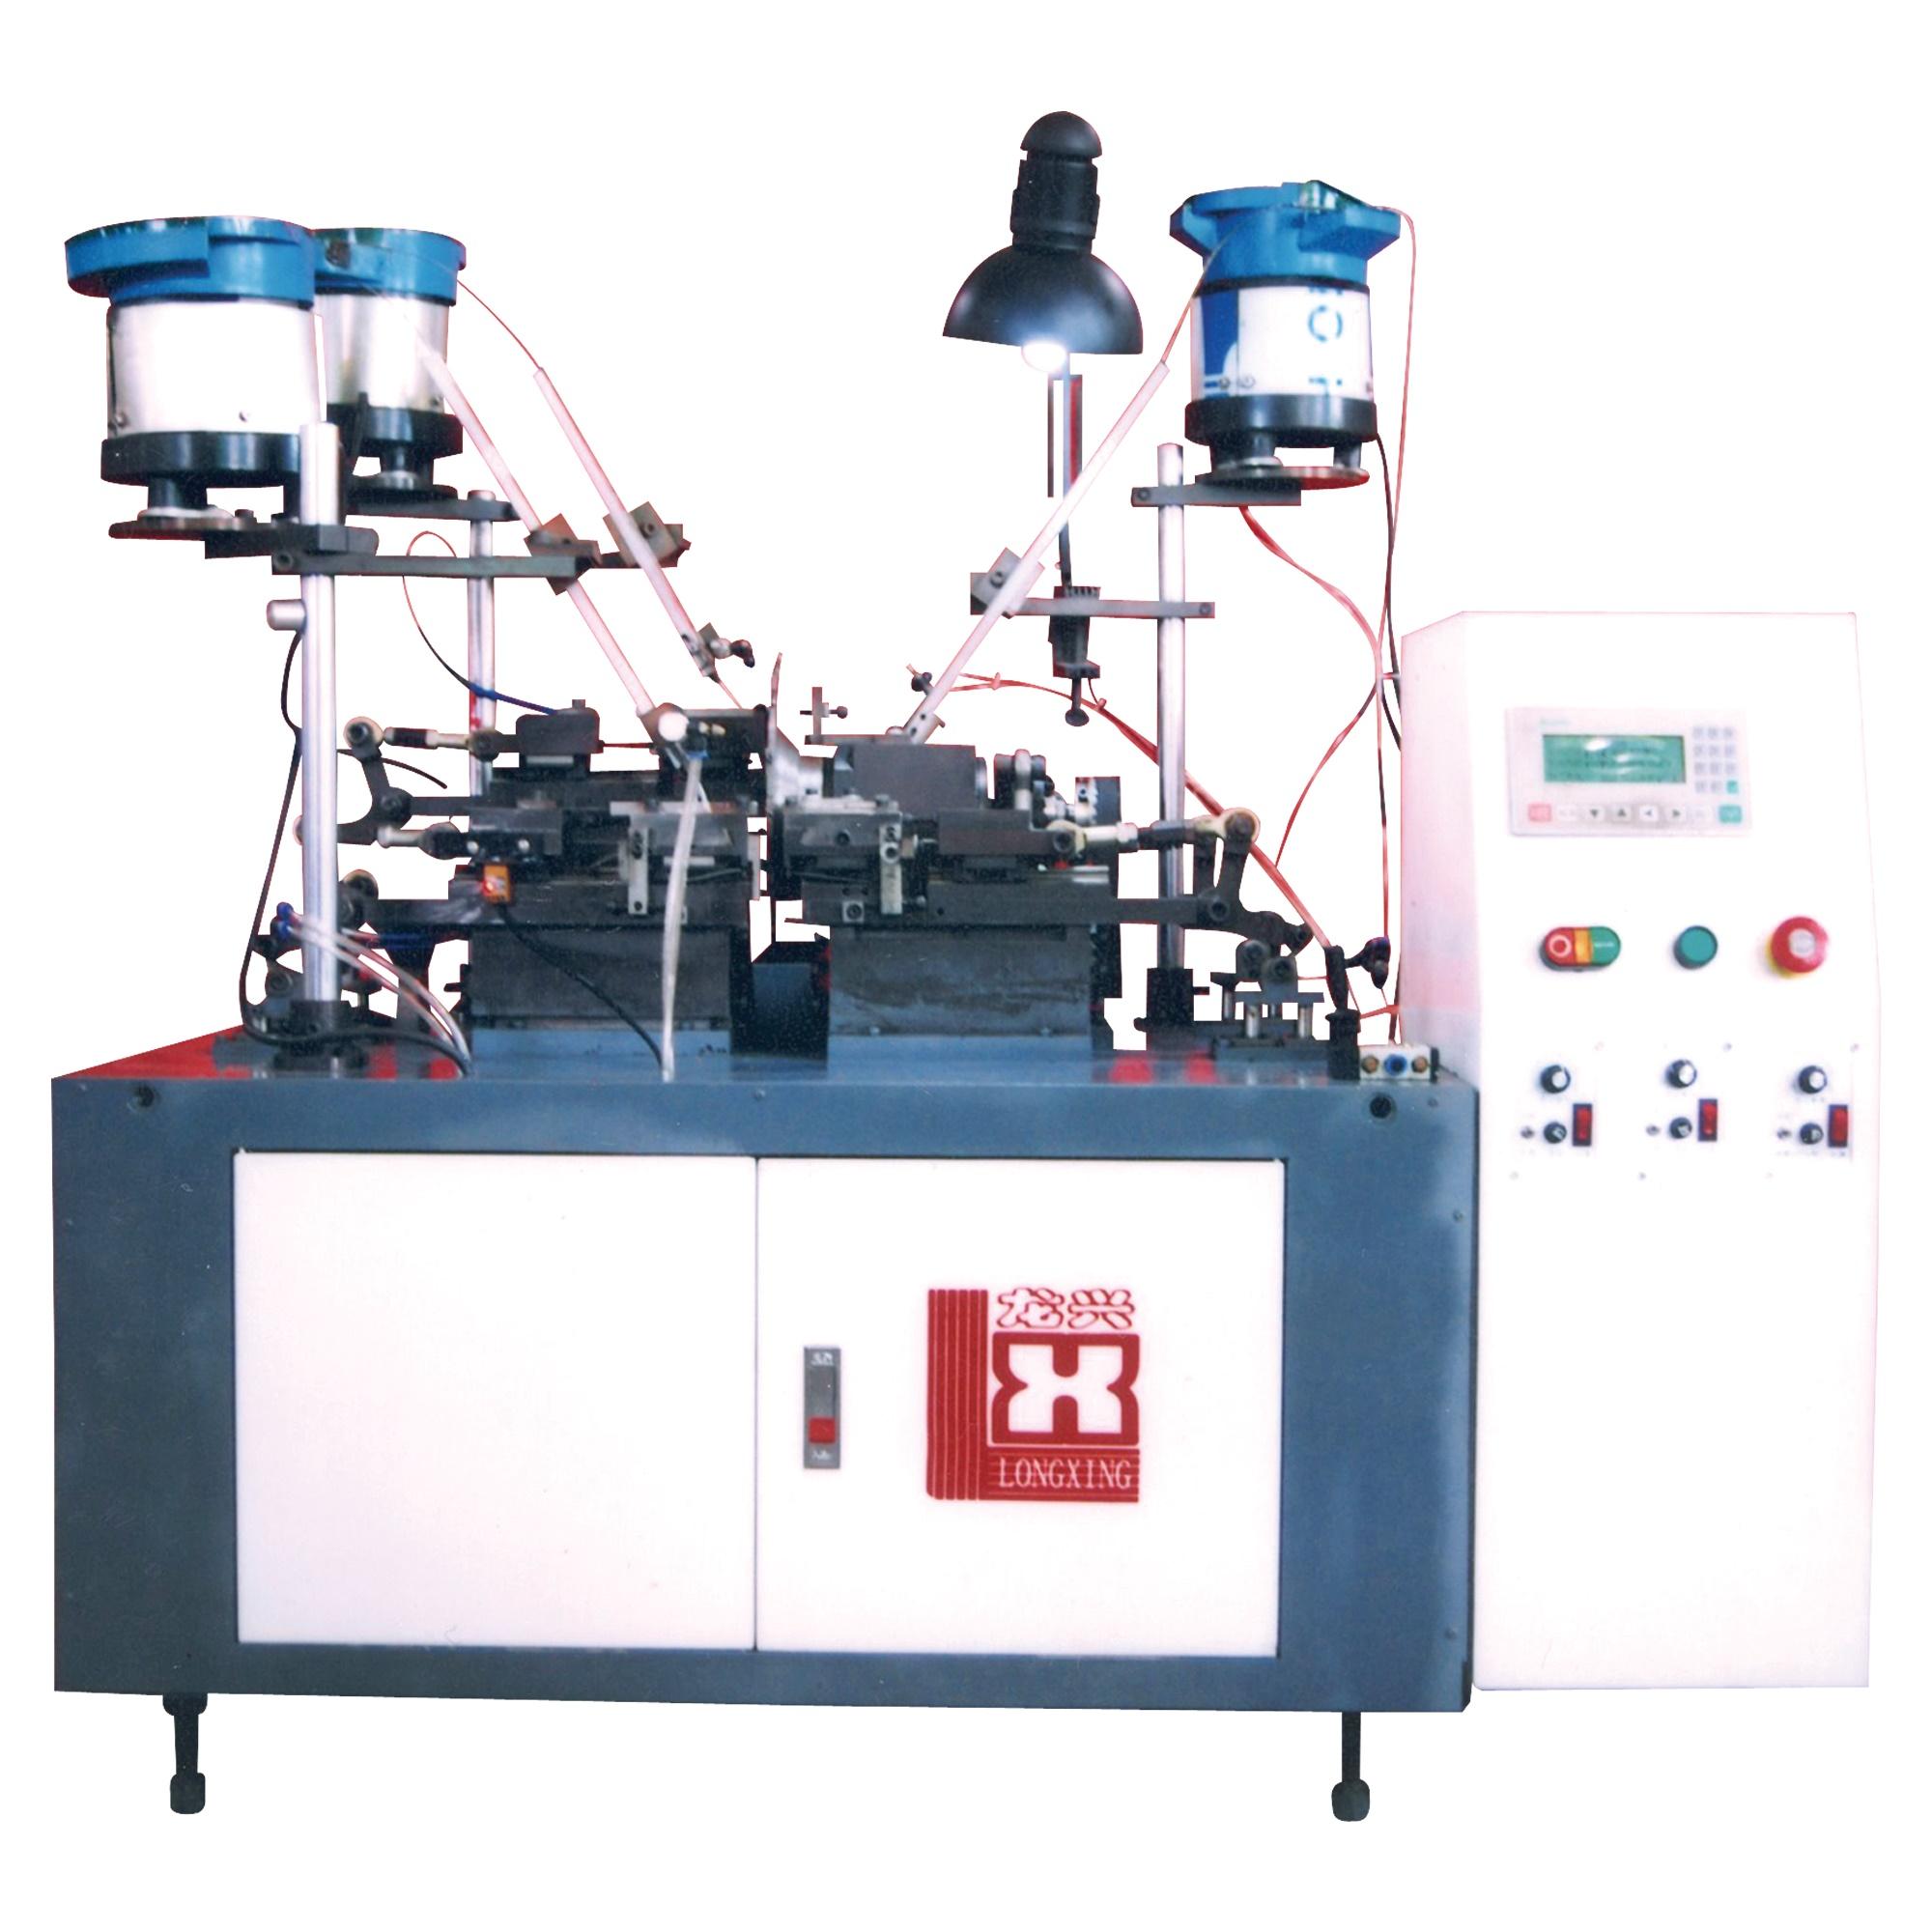 LX263 探針自動裝配機